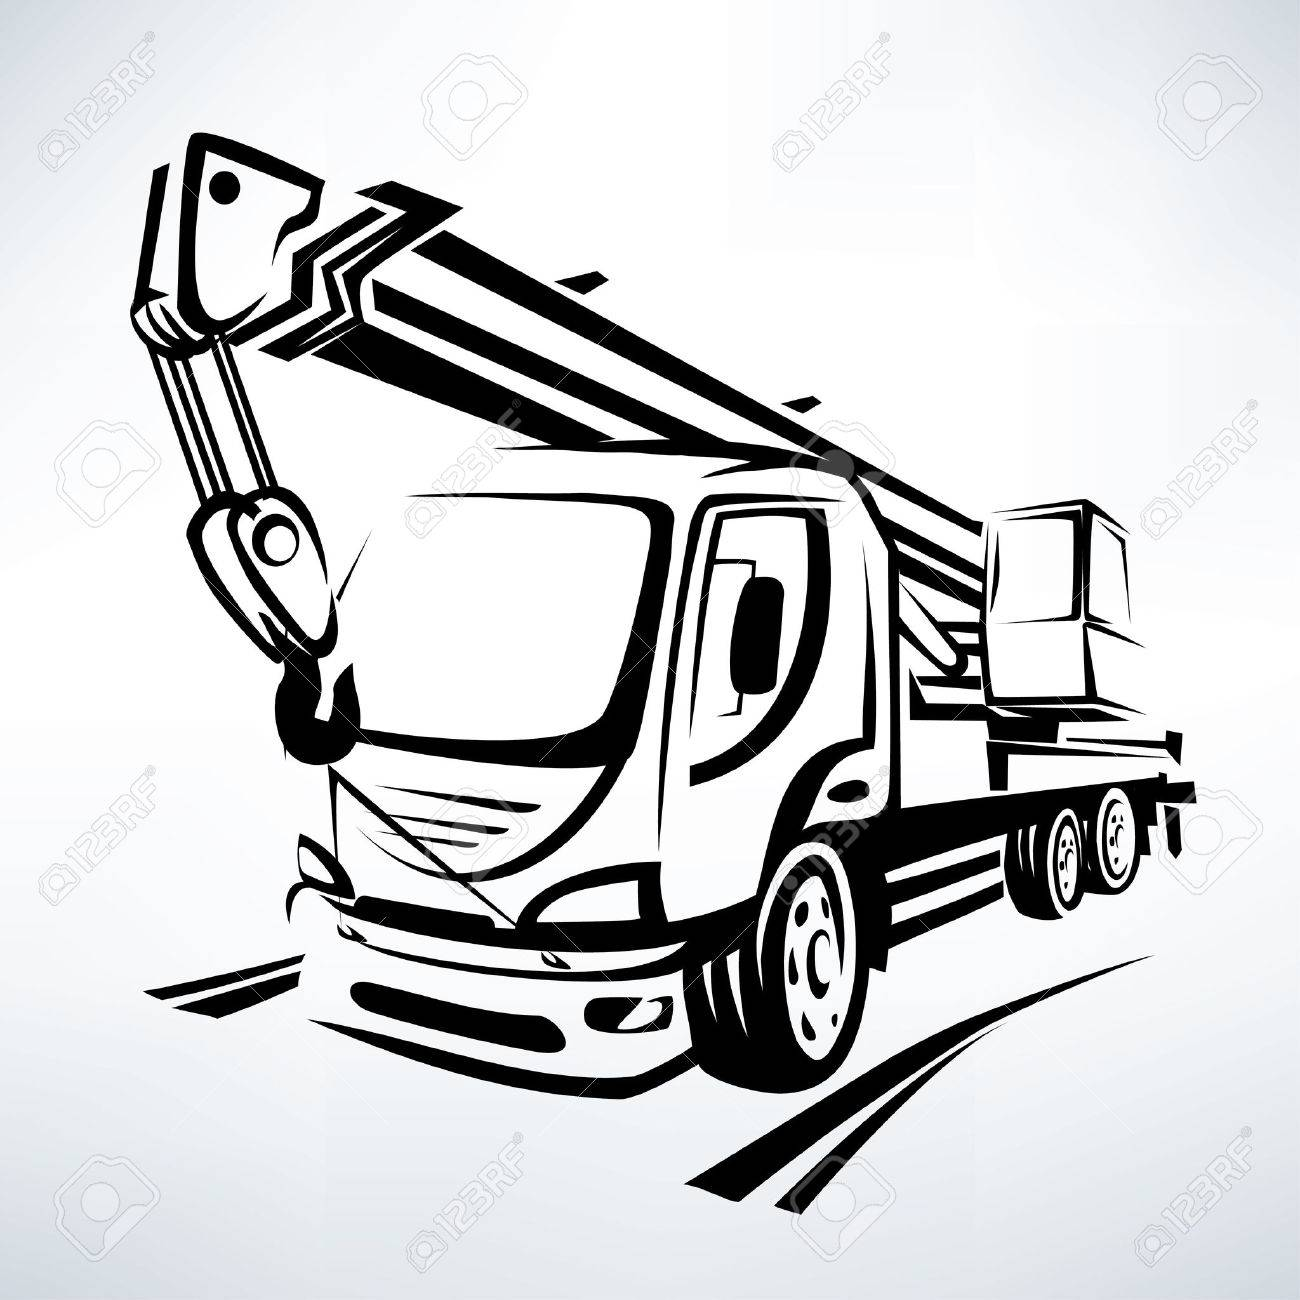 auto crane isolated vector symbol, stylized sketch - 59991261